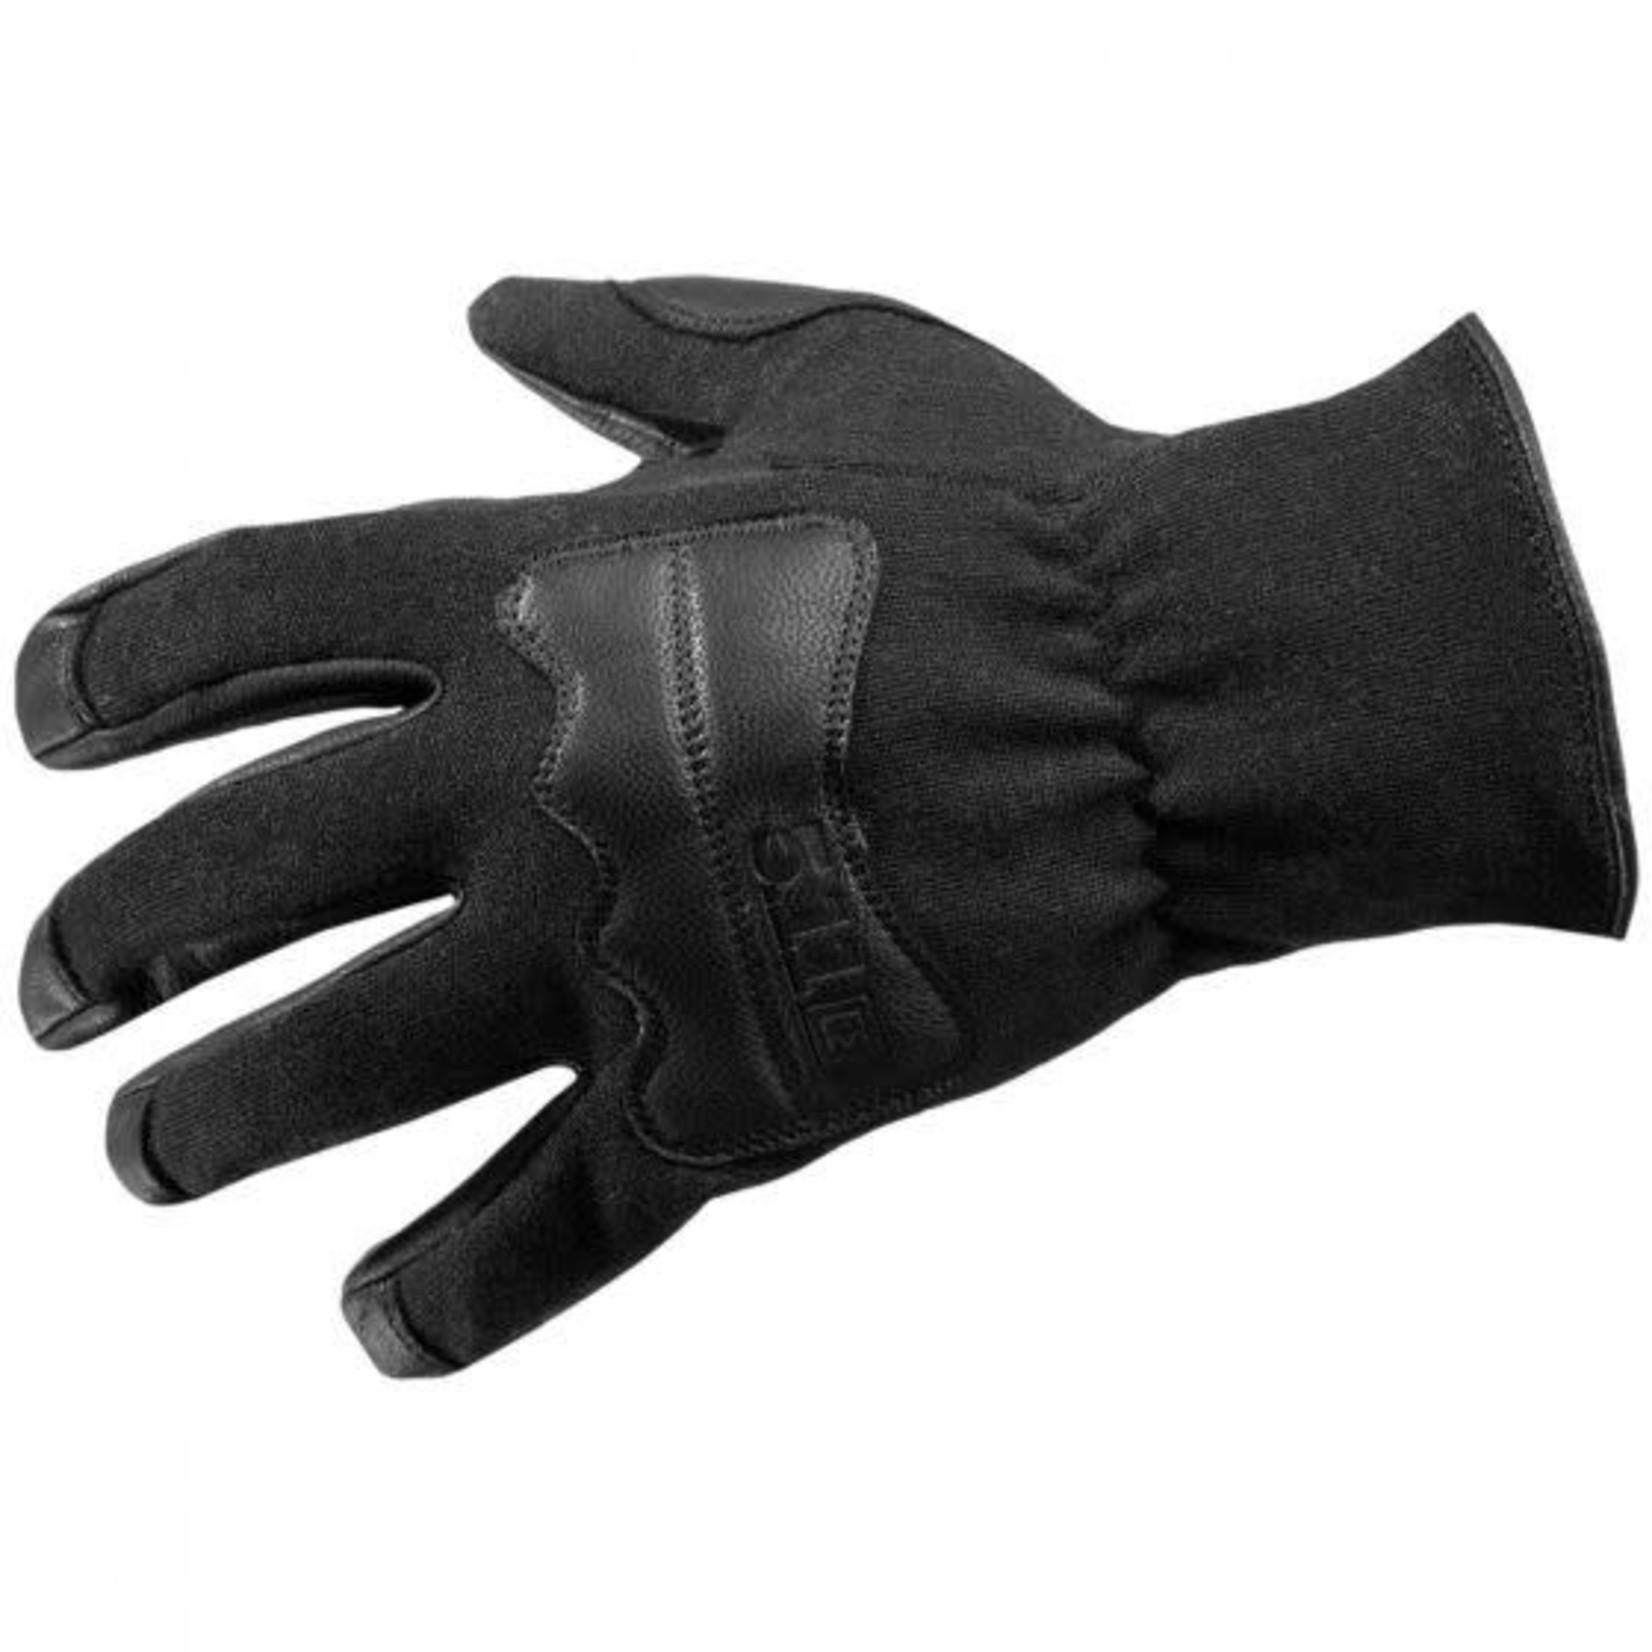 5.11 Tactical 5.11 Tac NF02 Glove